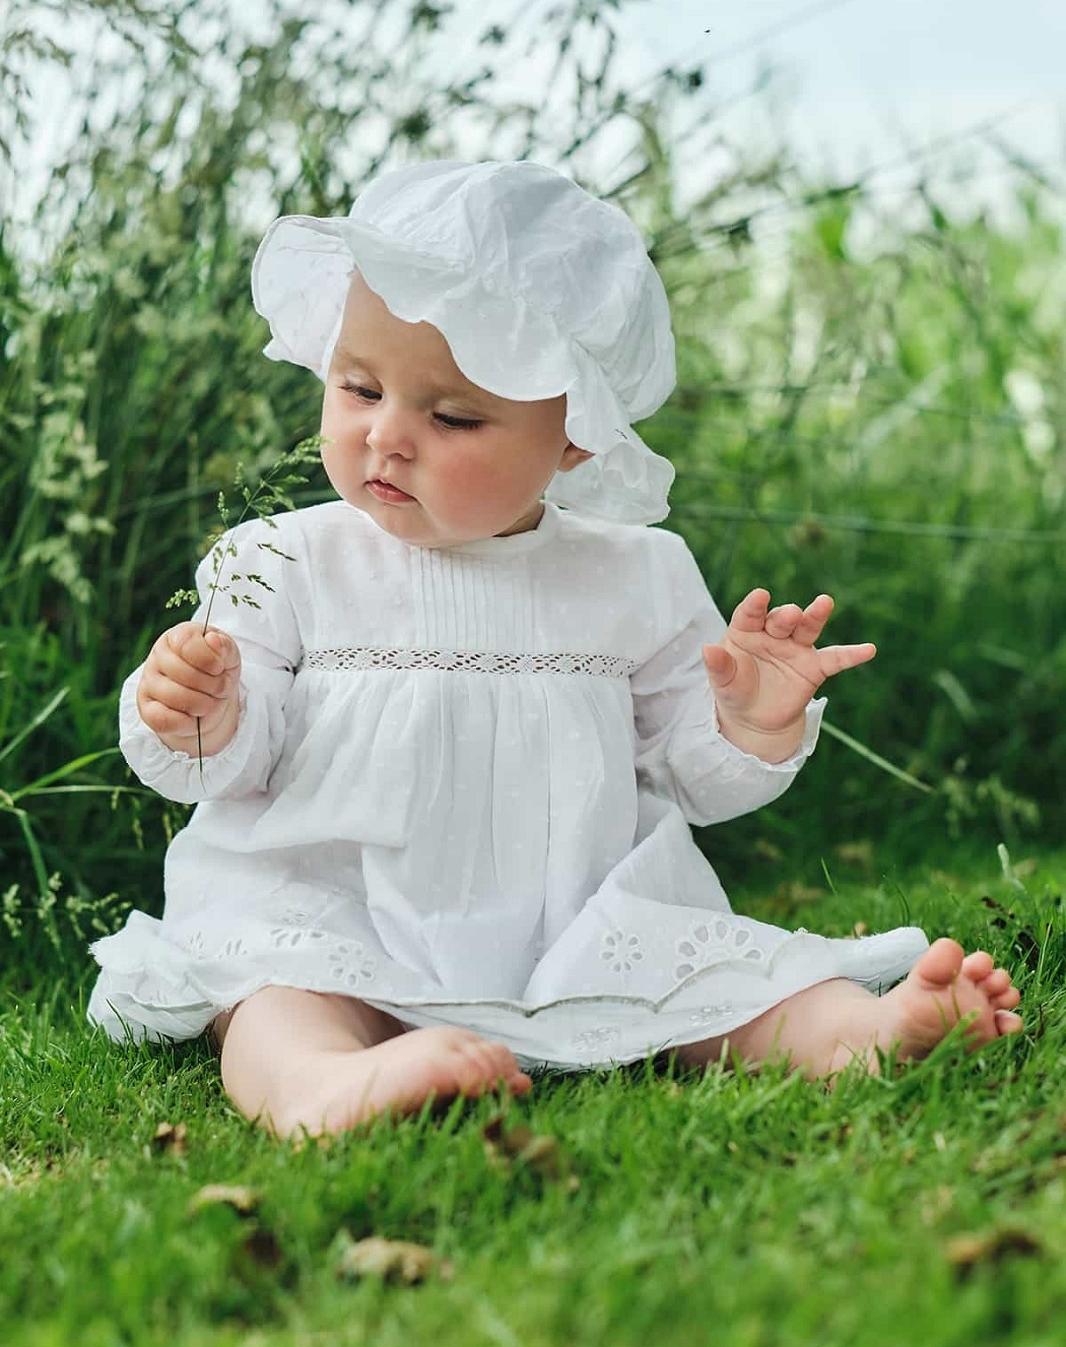 hust-claire-vit-babyklanning-spetsklanning-29937128